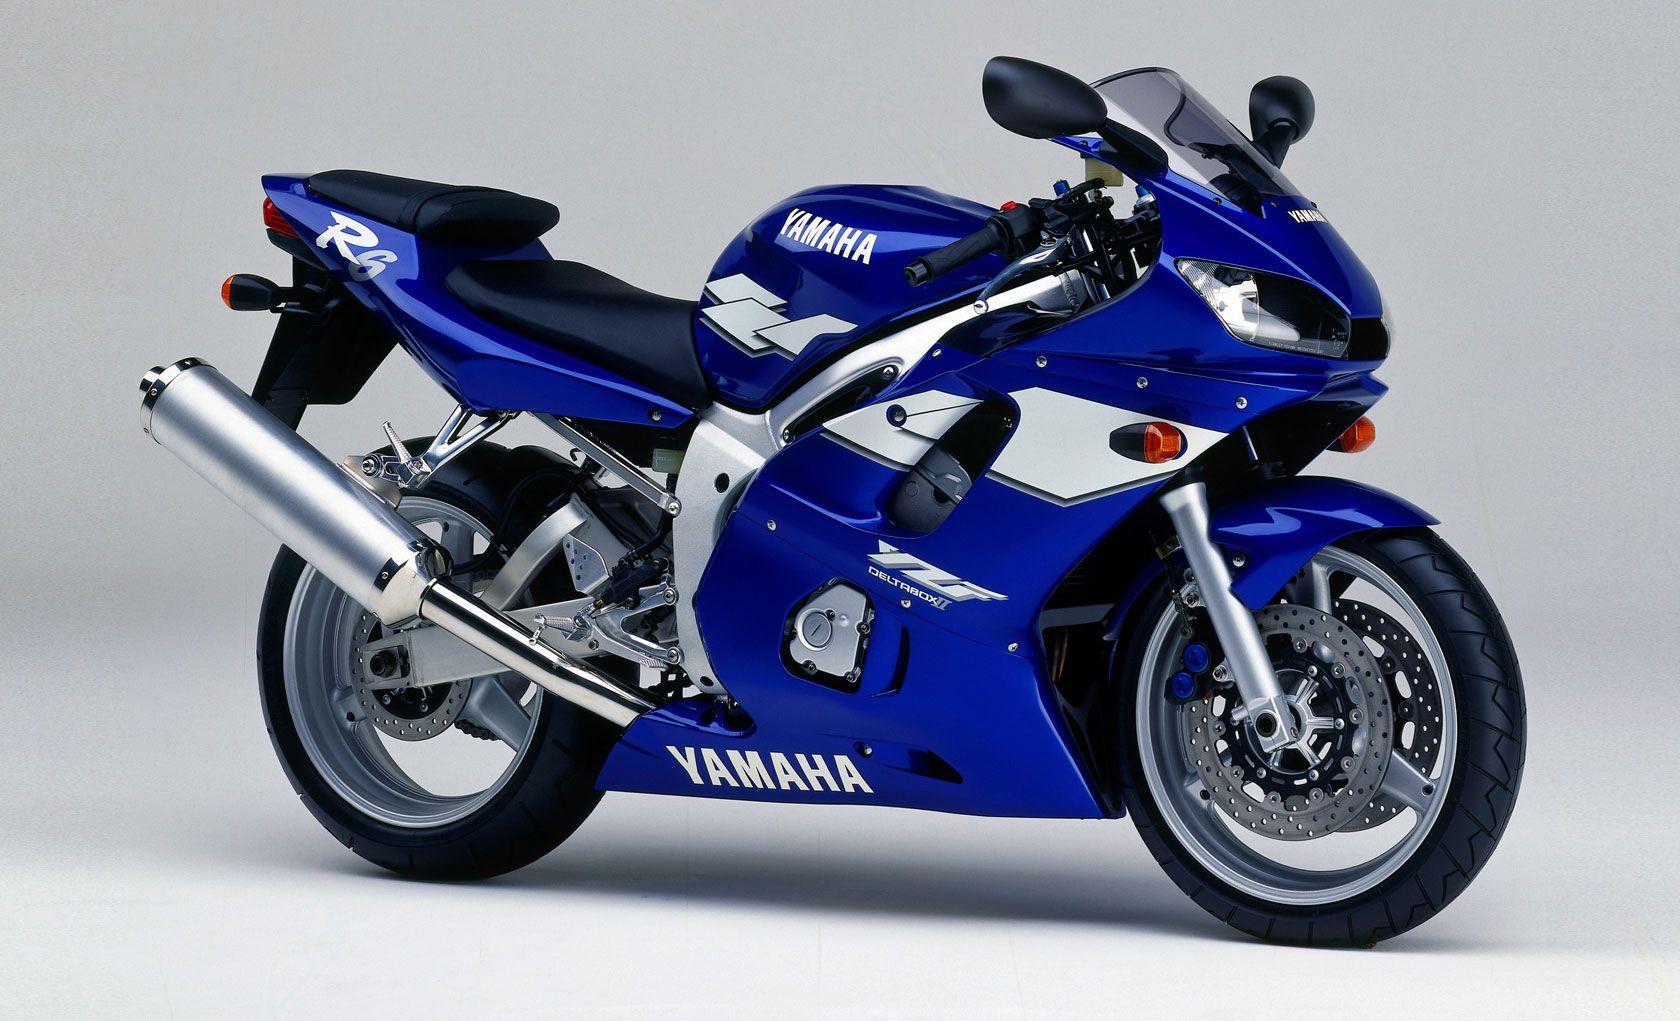 Yamaha yzf r125 usata moto usate 2016 car release date - V Nh C 1 A Yamaha Logo M U B C Ch Bi Si U Th Ph T Ng Online B V Nh 18 Nan 2 A Pinterest Honda